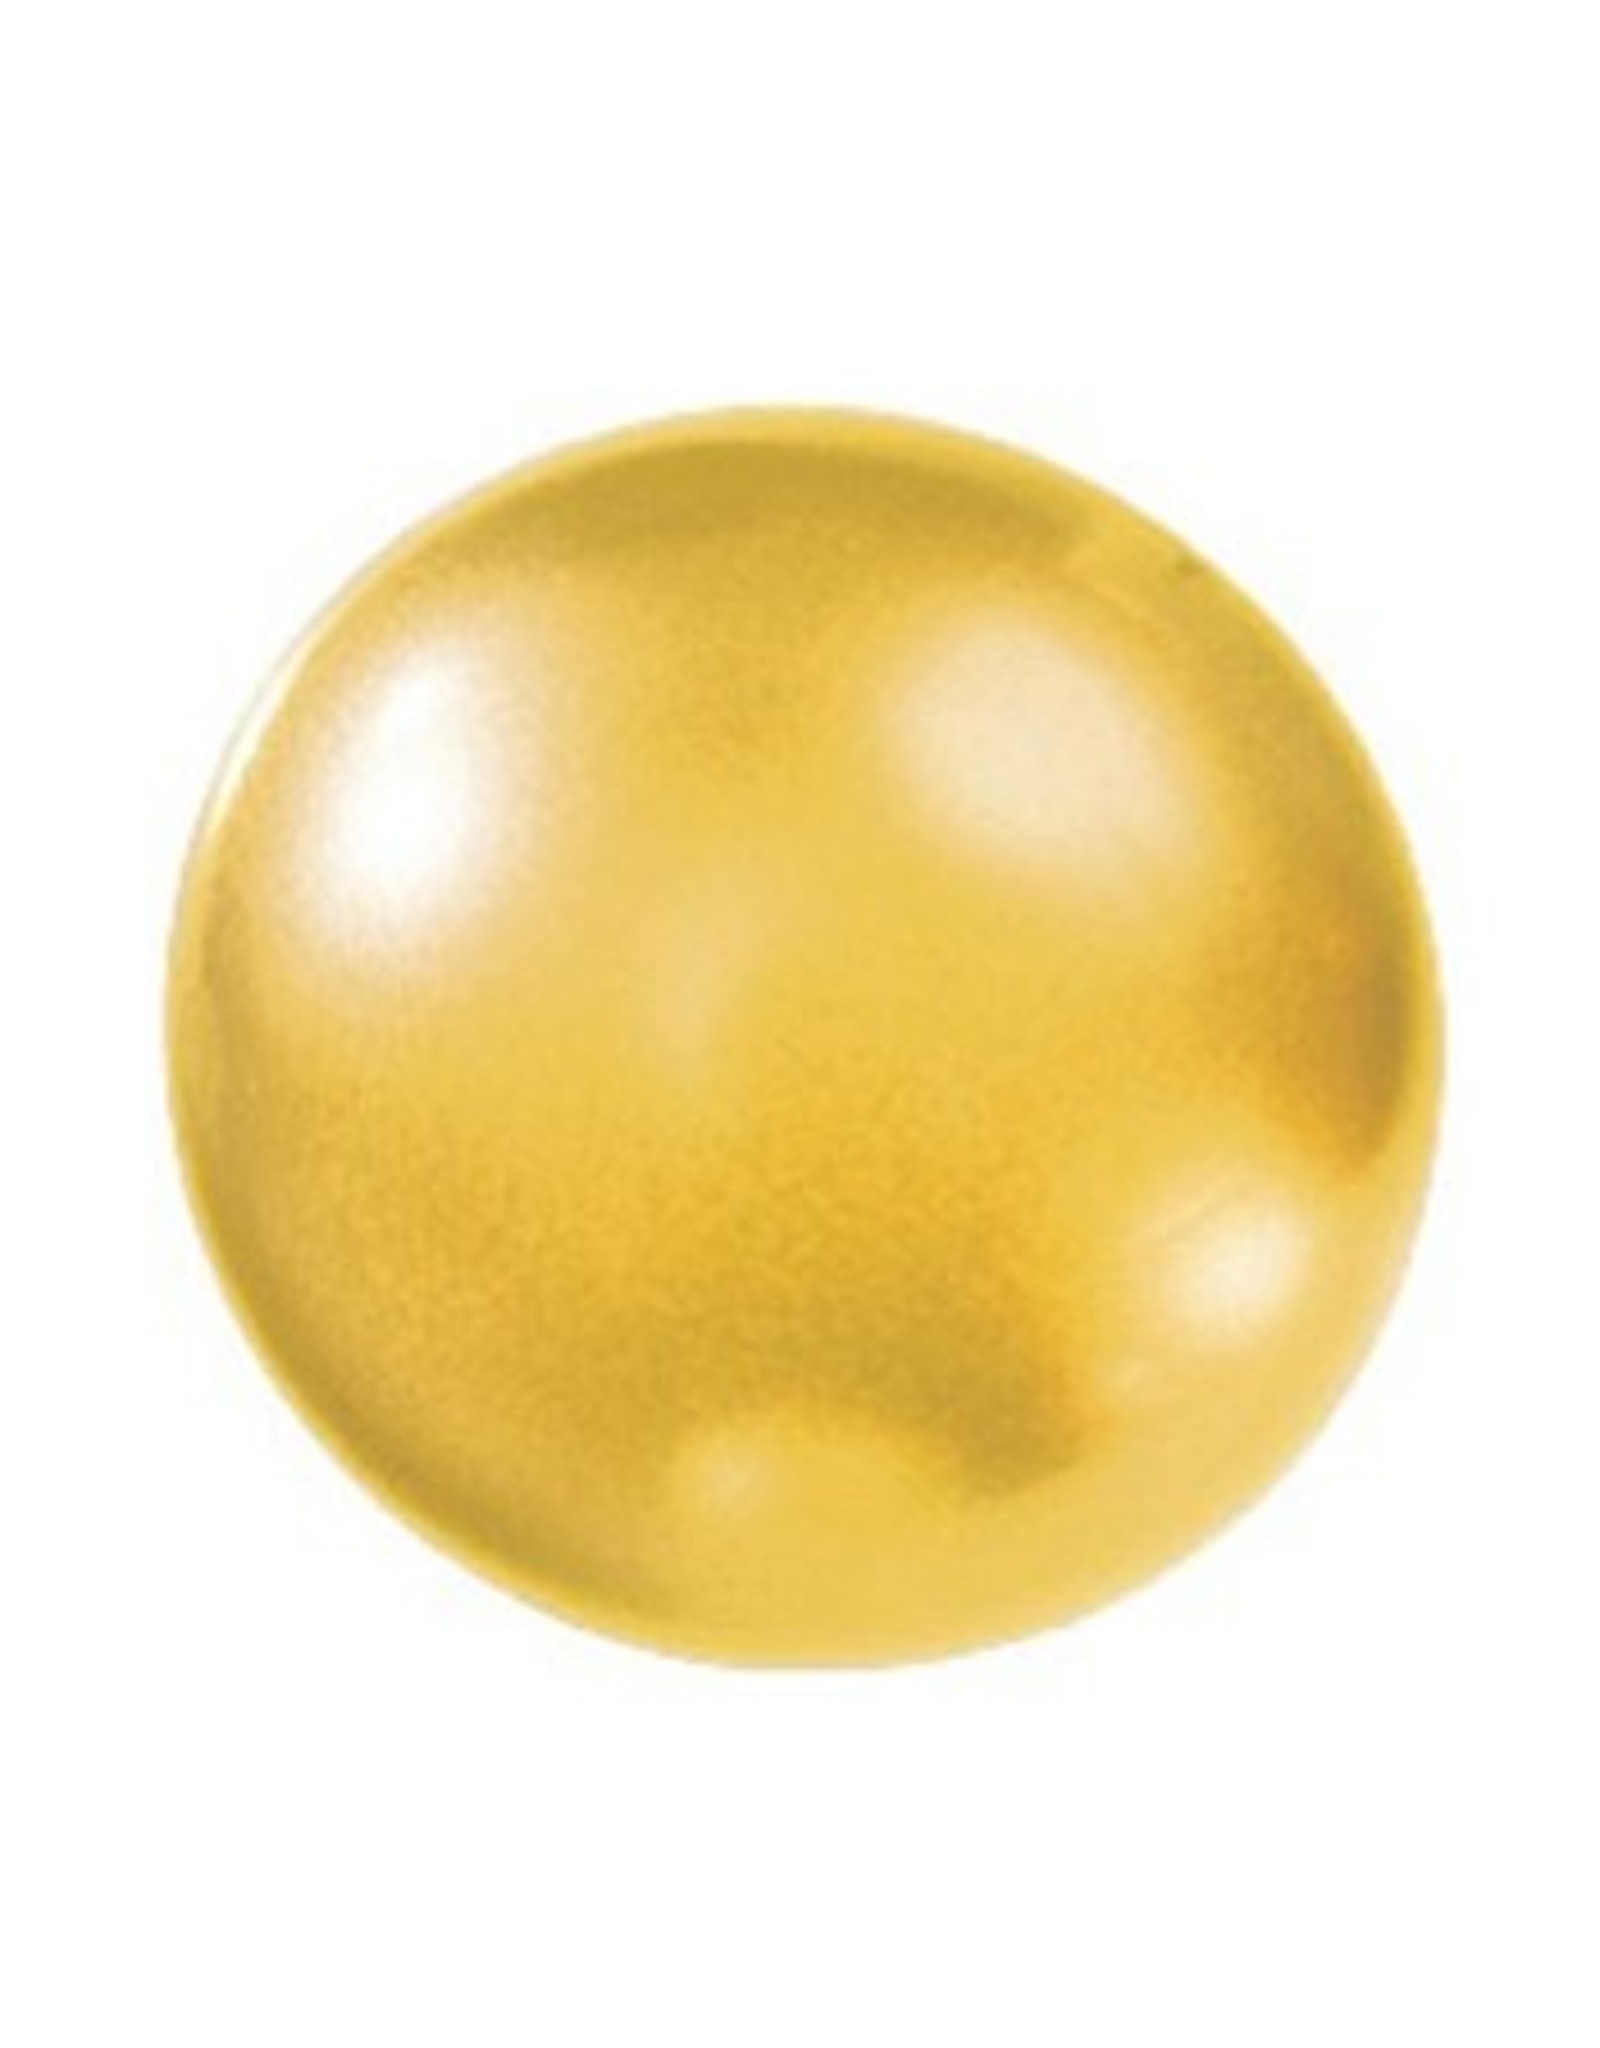 Badparel (geel) nacre - Body & Soap